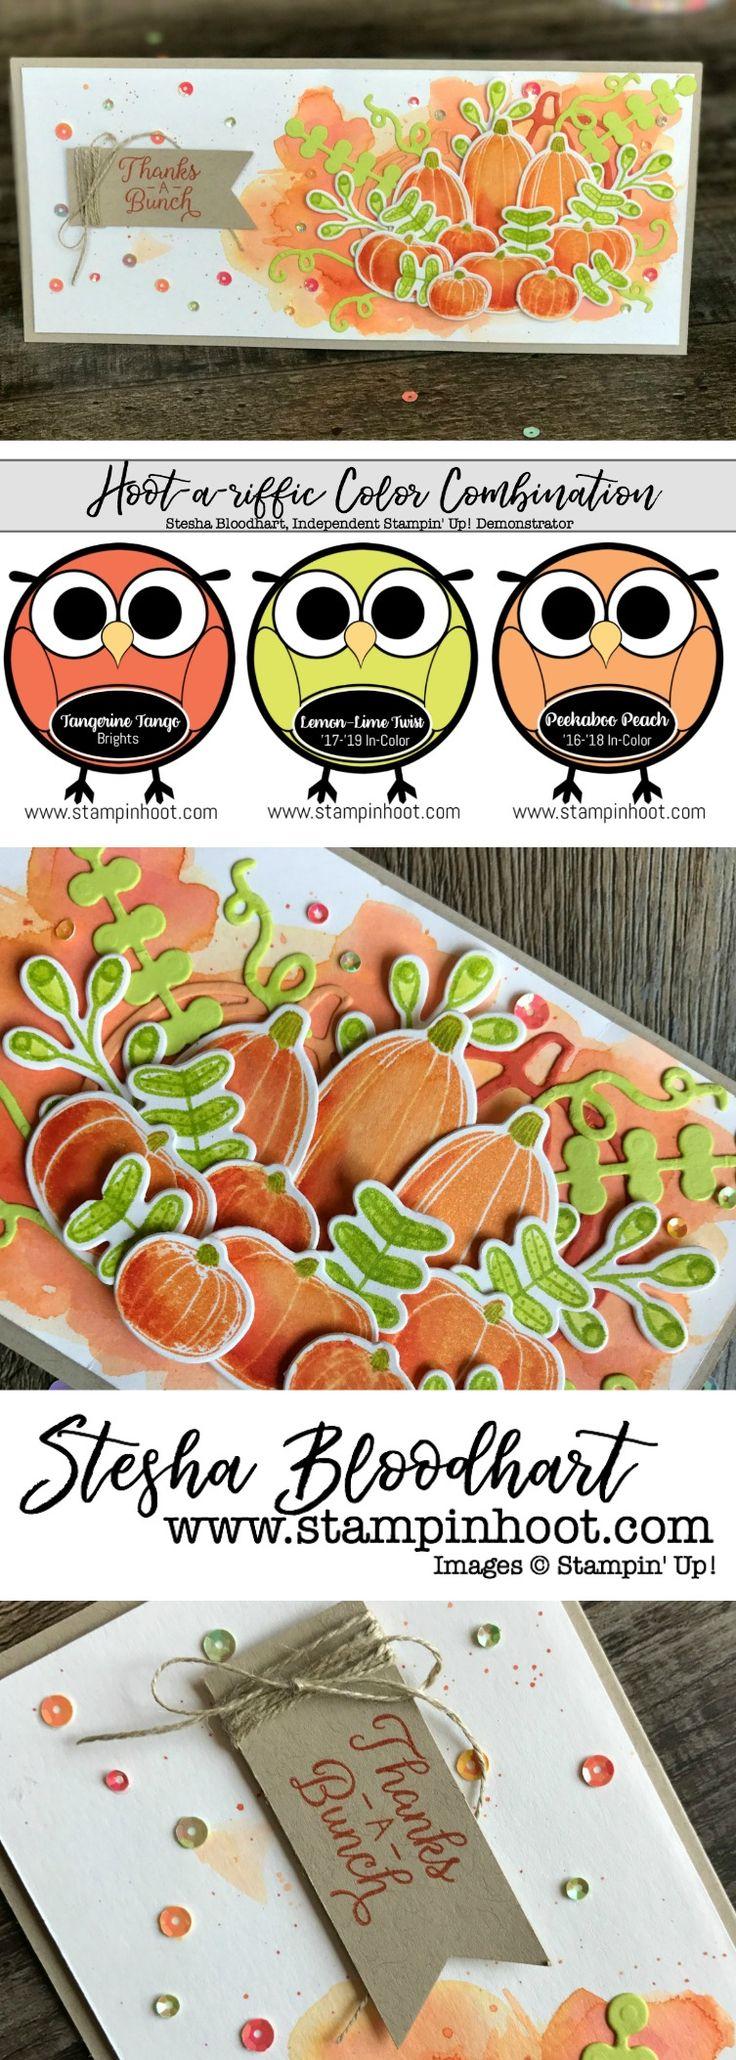 Pick A Pumpkin Bundle from Stampin' Up! 2017 Holiday Catalog for Global Design Project 105 #GDP105 #pickapumpkin #2017holidaycatalog #stampinup #thankyoucard